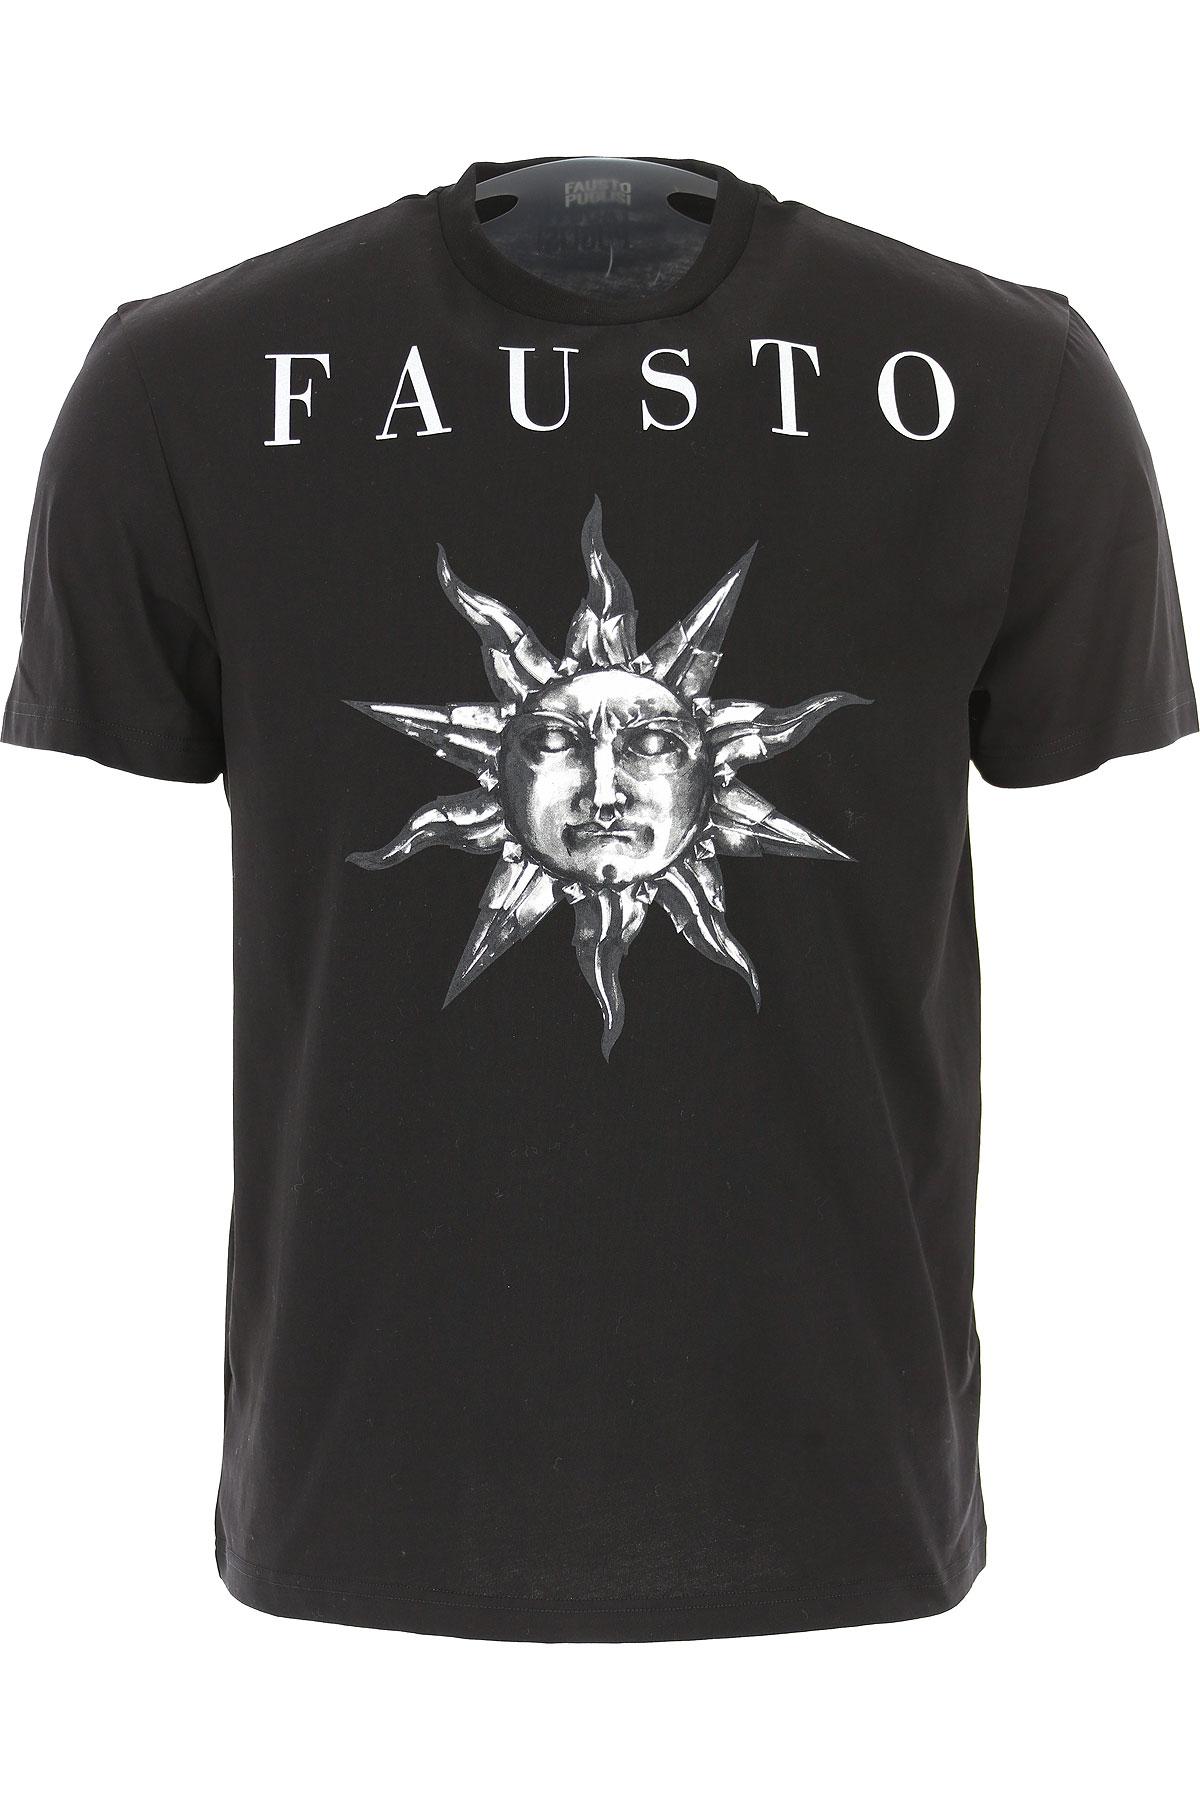 Image of Fausto Puglisi T-Shirt for Men, Black, Cotton, 2017, L M XL